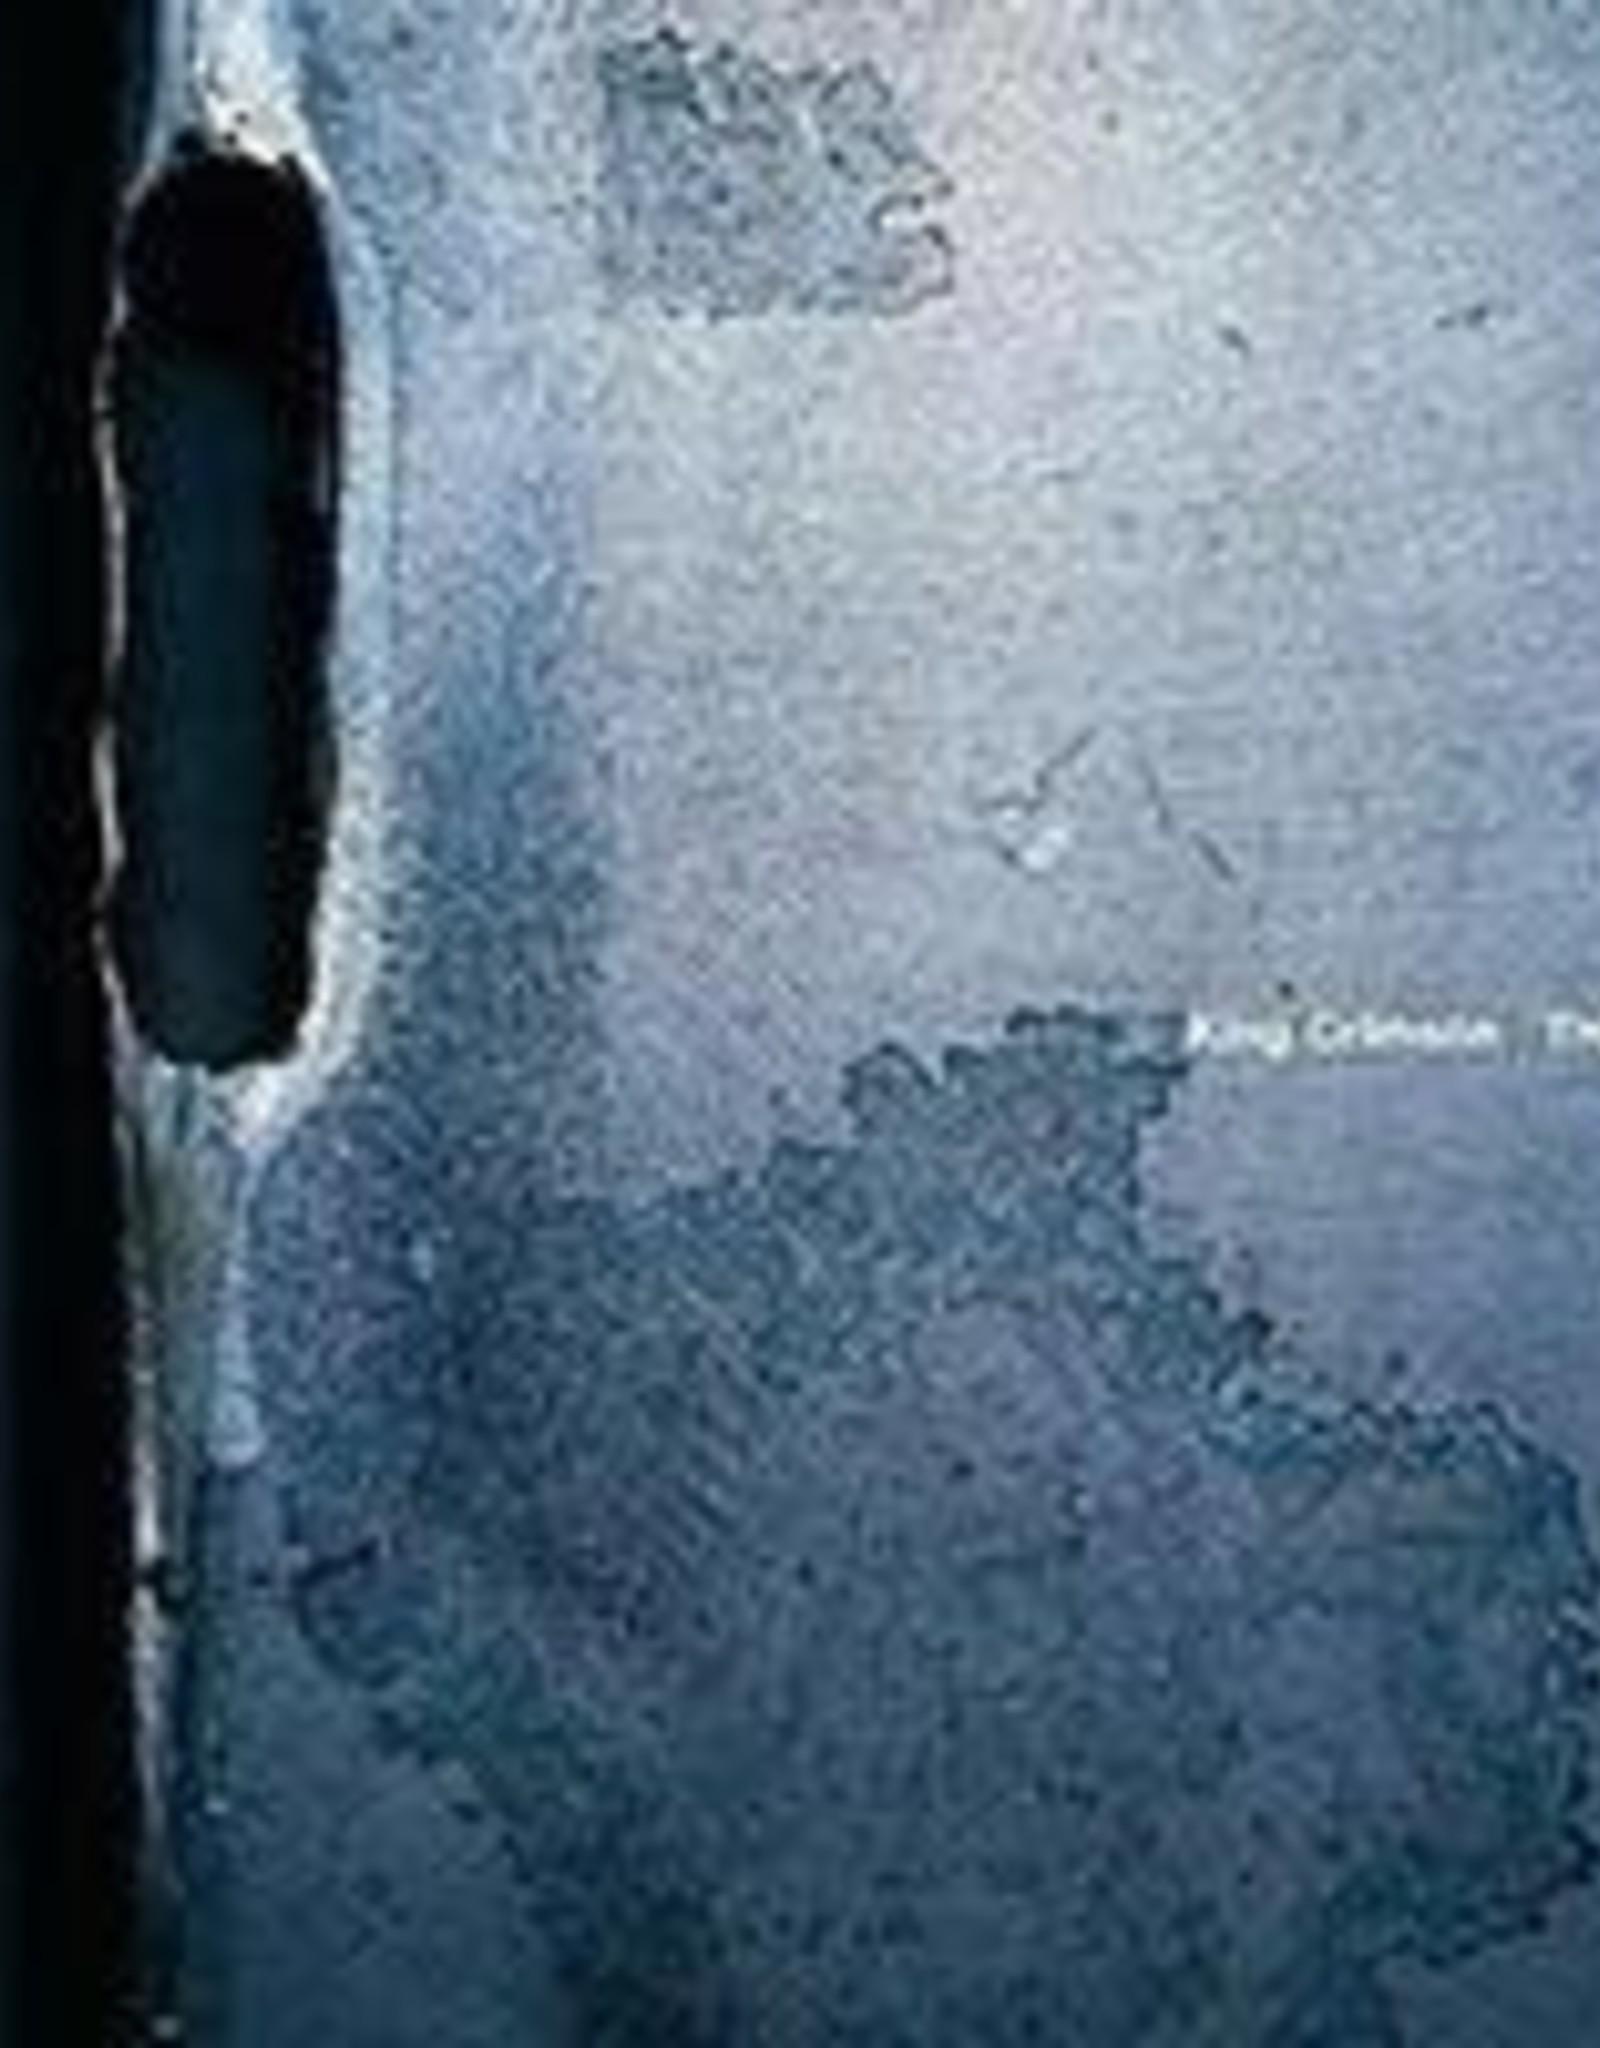 King Crimson - Thrak (200gm Vinyl)